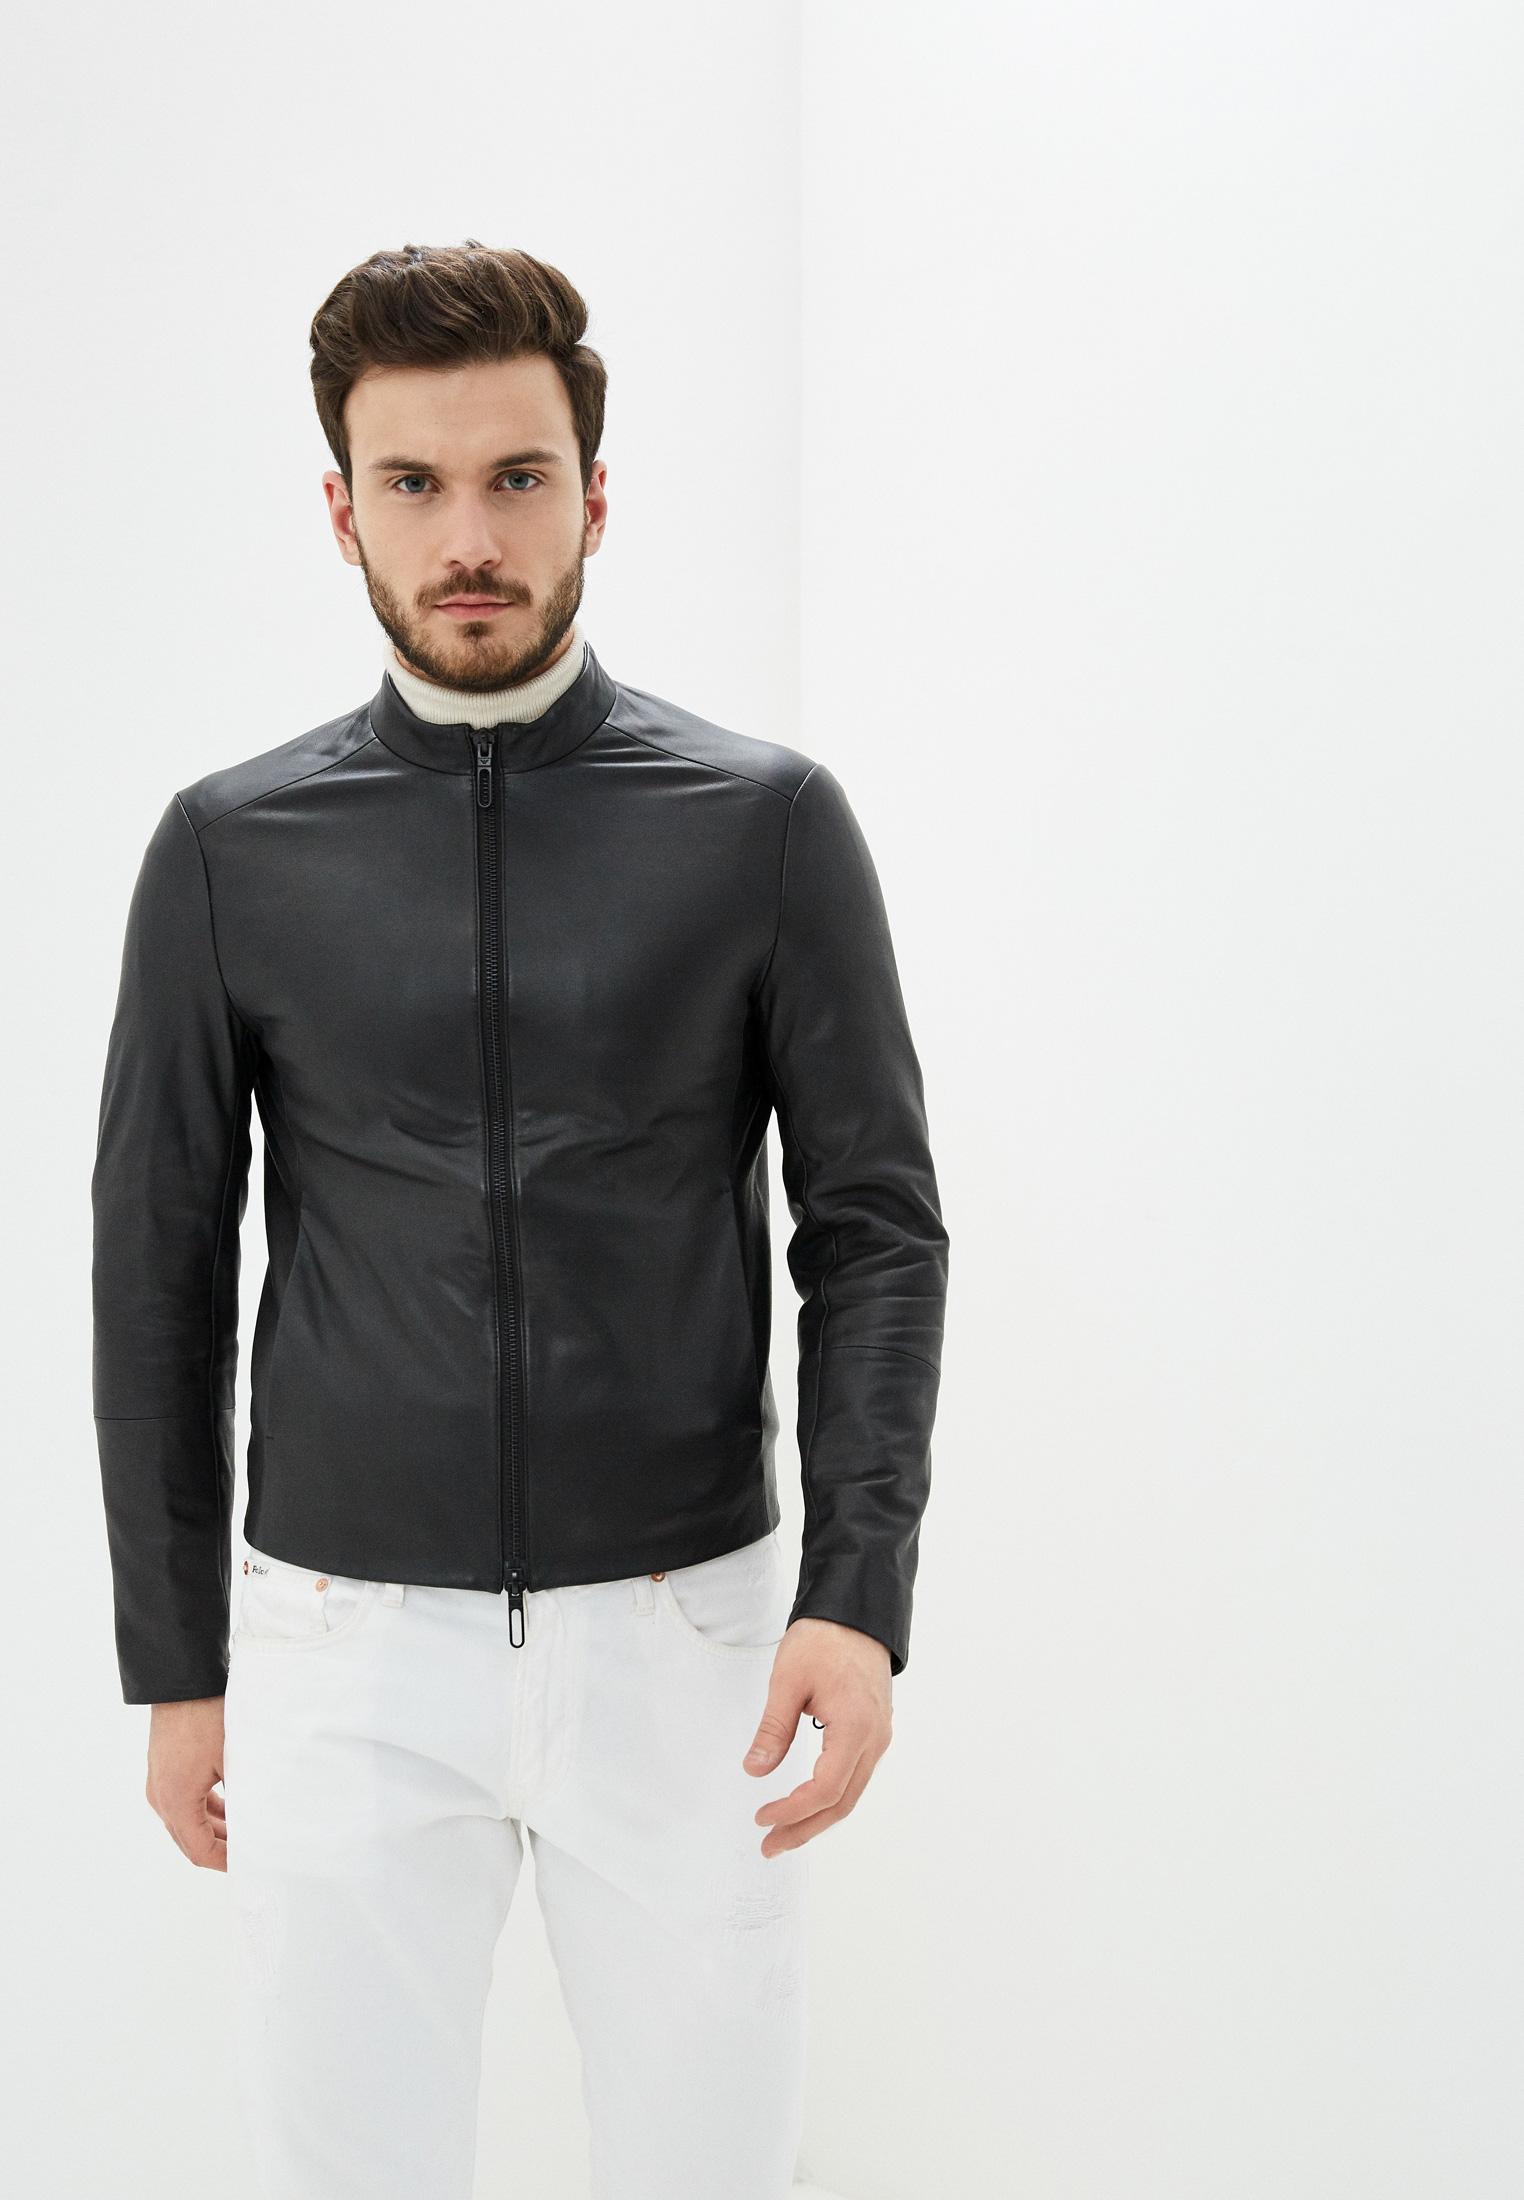 Кожаная куртка Emporio Armani 51b57p 51P57